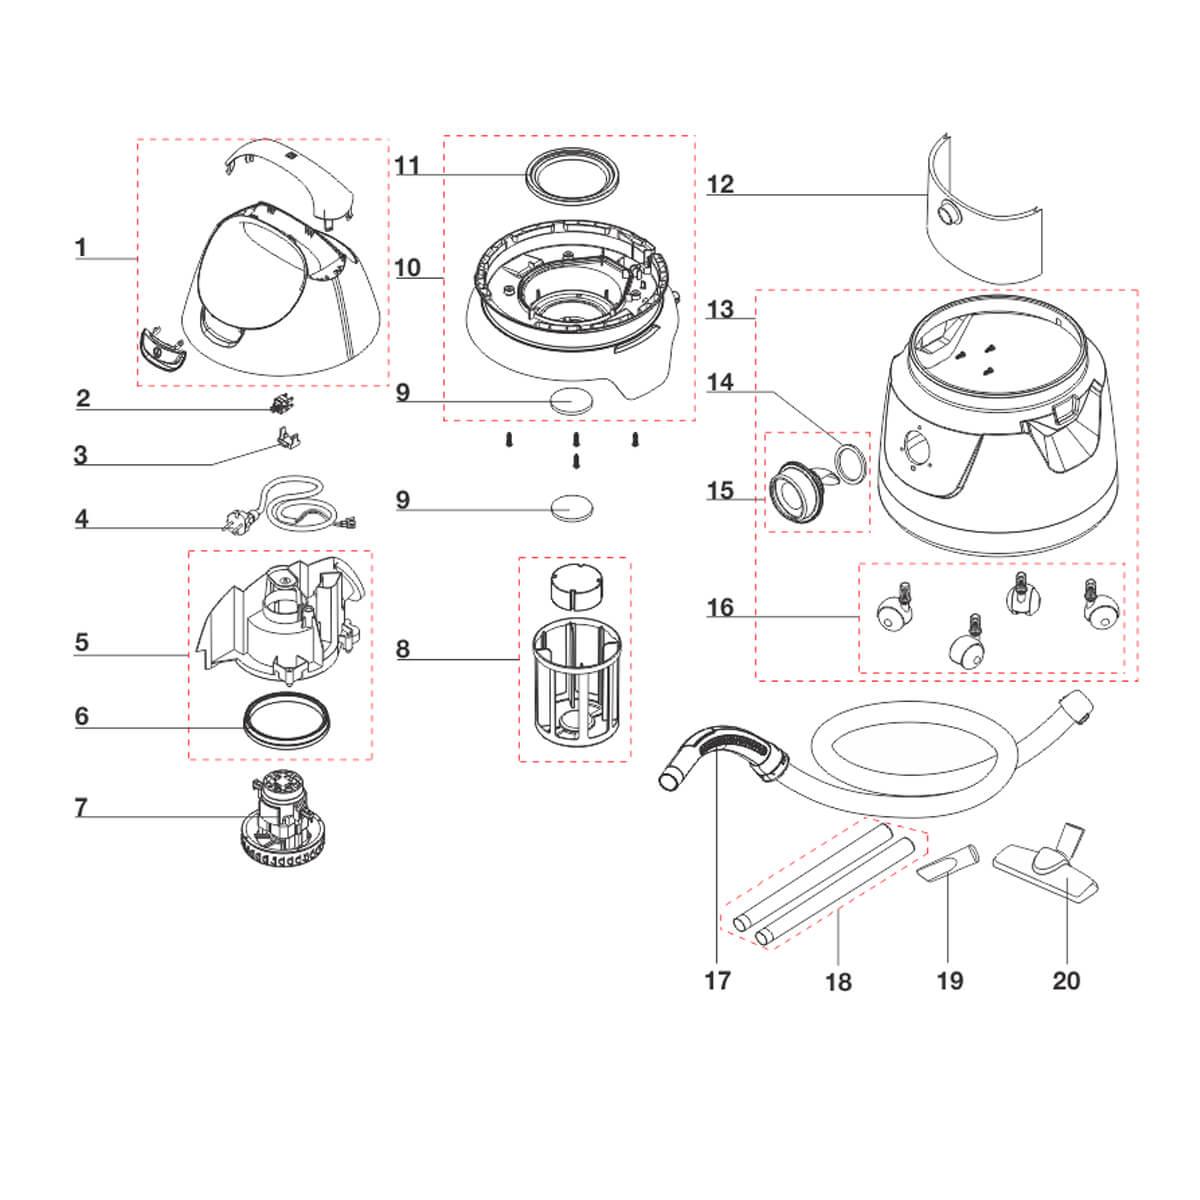 Conjunto Suporte Inferior A10N1 Aspirador De Pó e Água Electrolux -  70004253